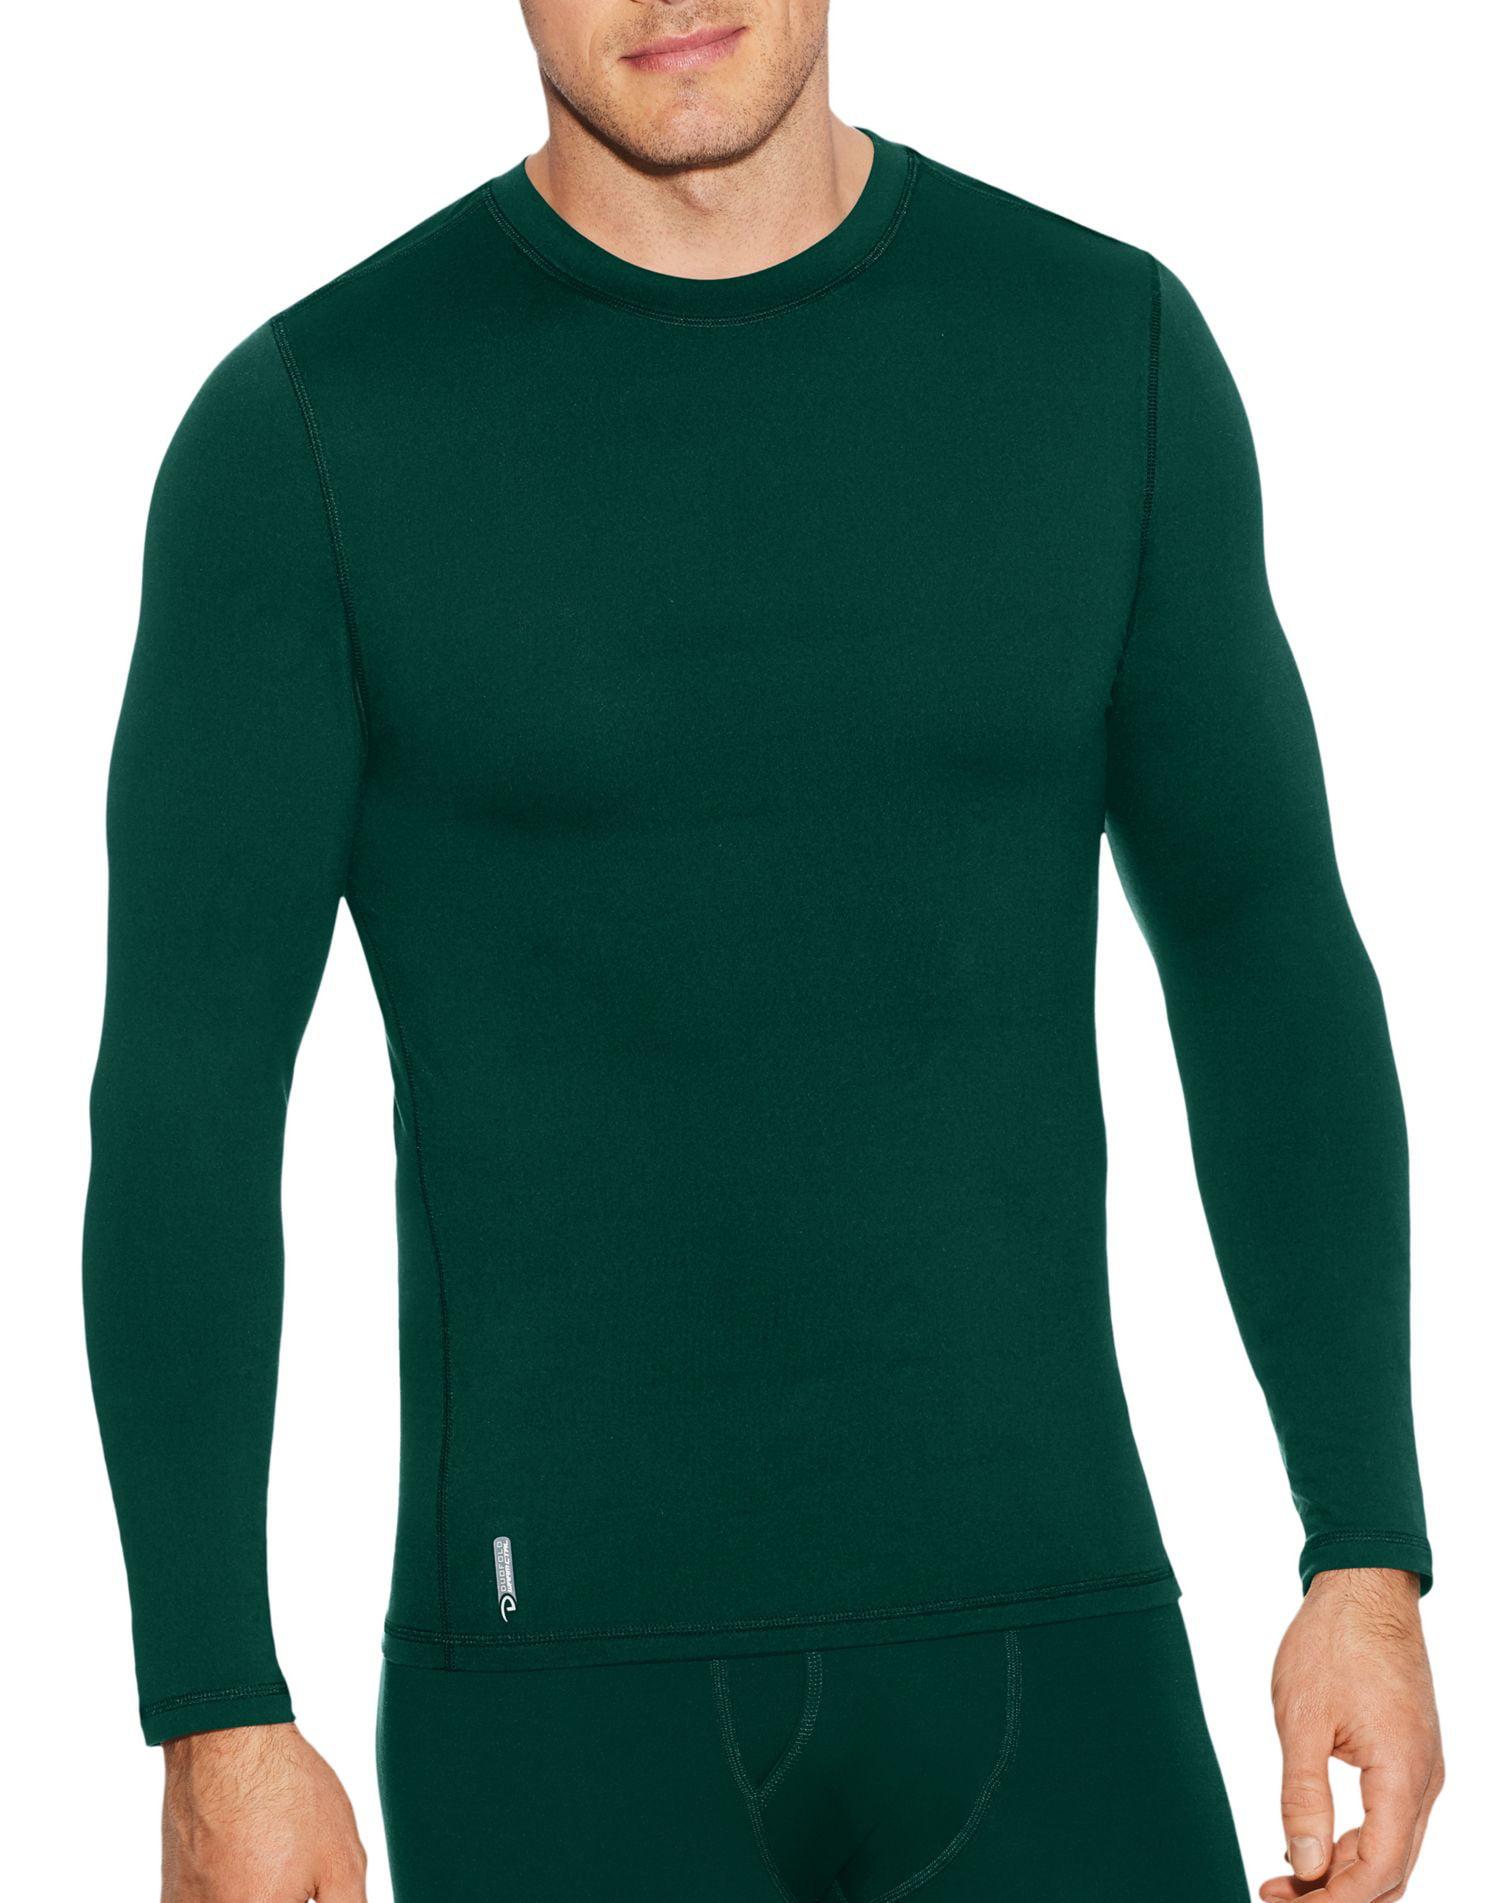 Duofold Womens Flex Weight Thermal Shirt